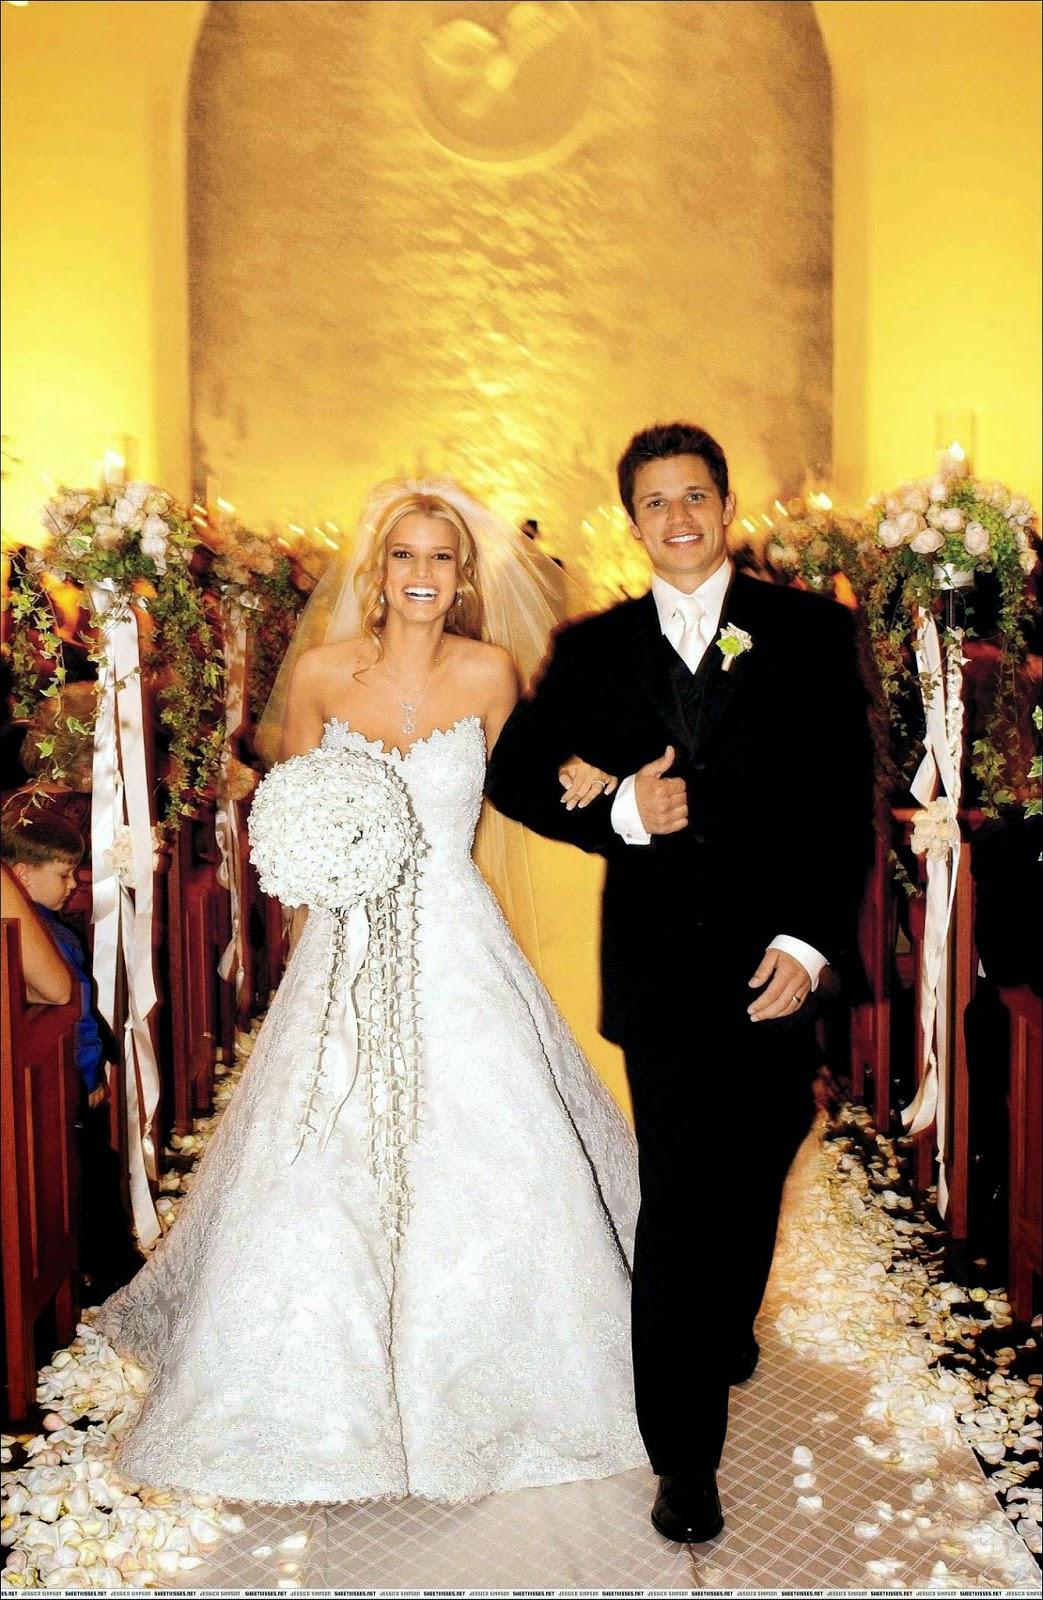 HERAIC: CELEBRITY WEDDING DRESSES